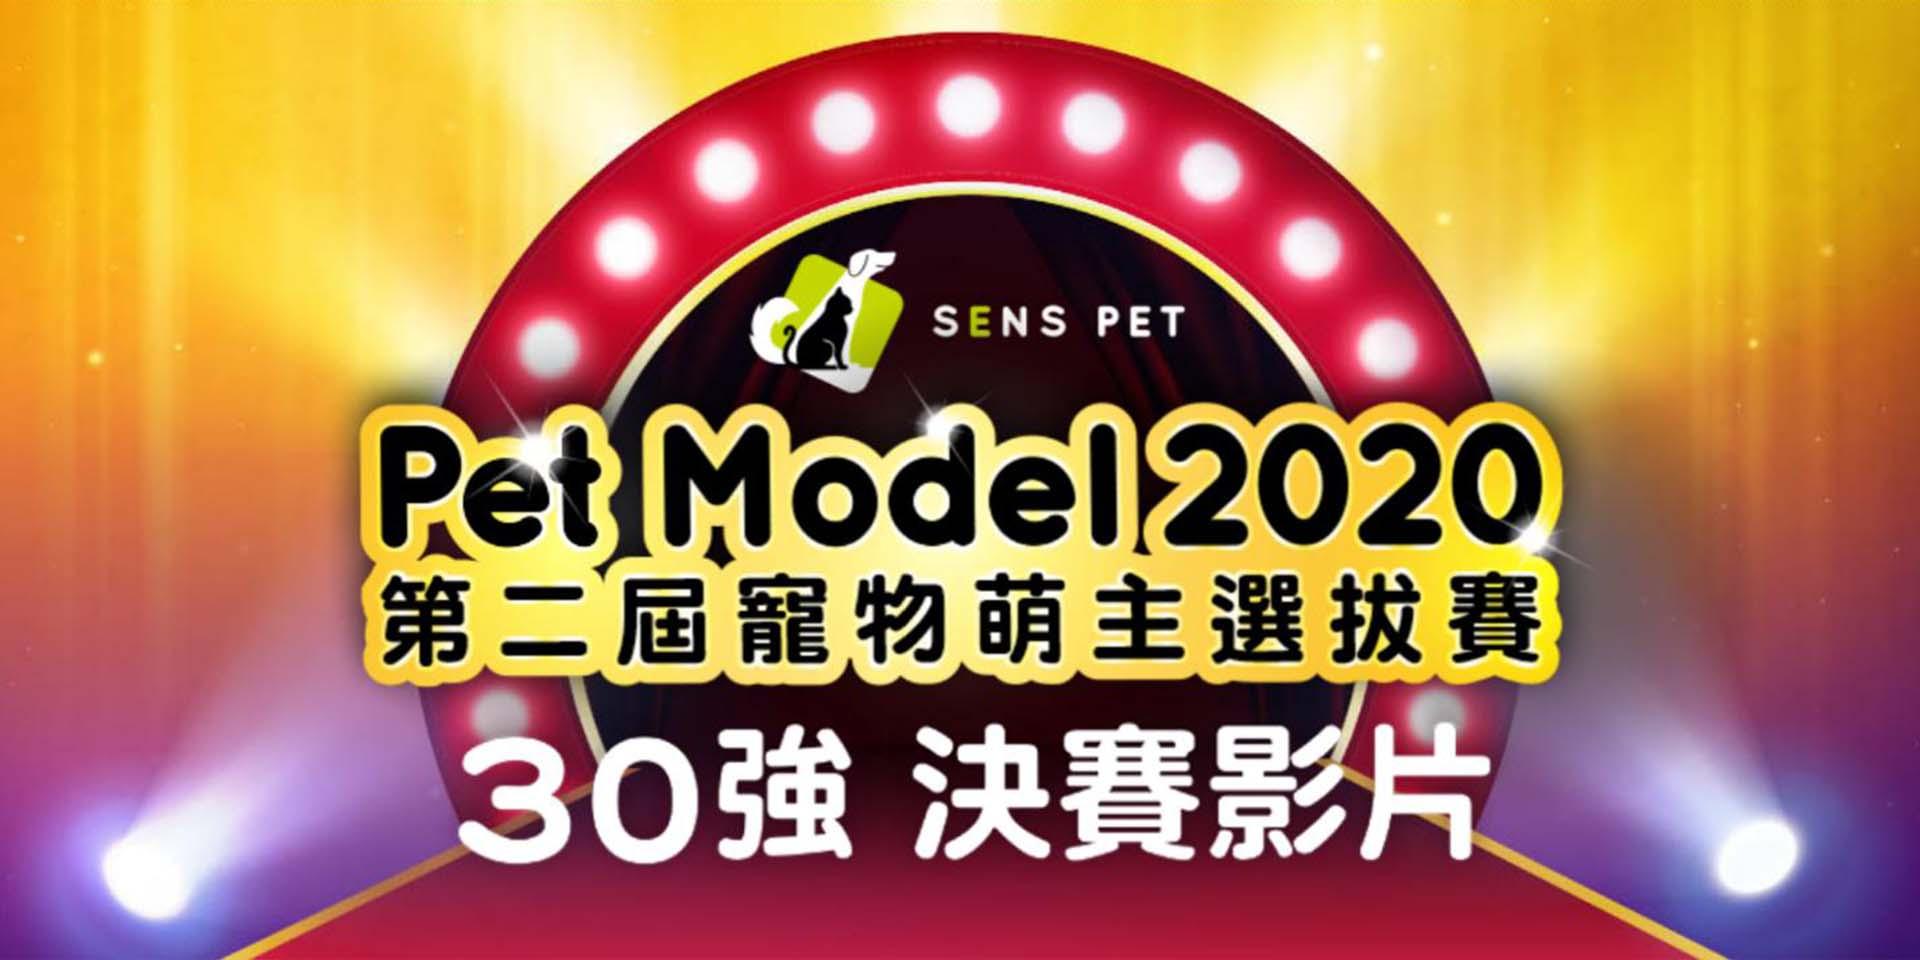 Pet Model 2020 Banner